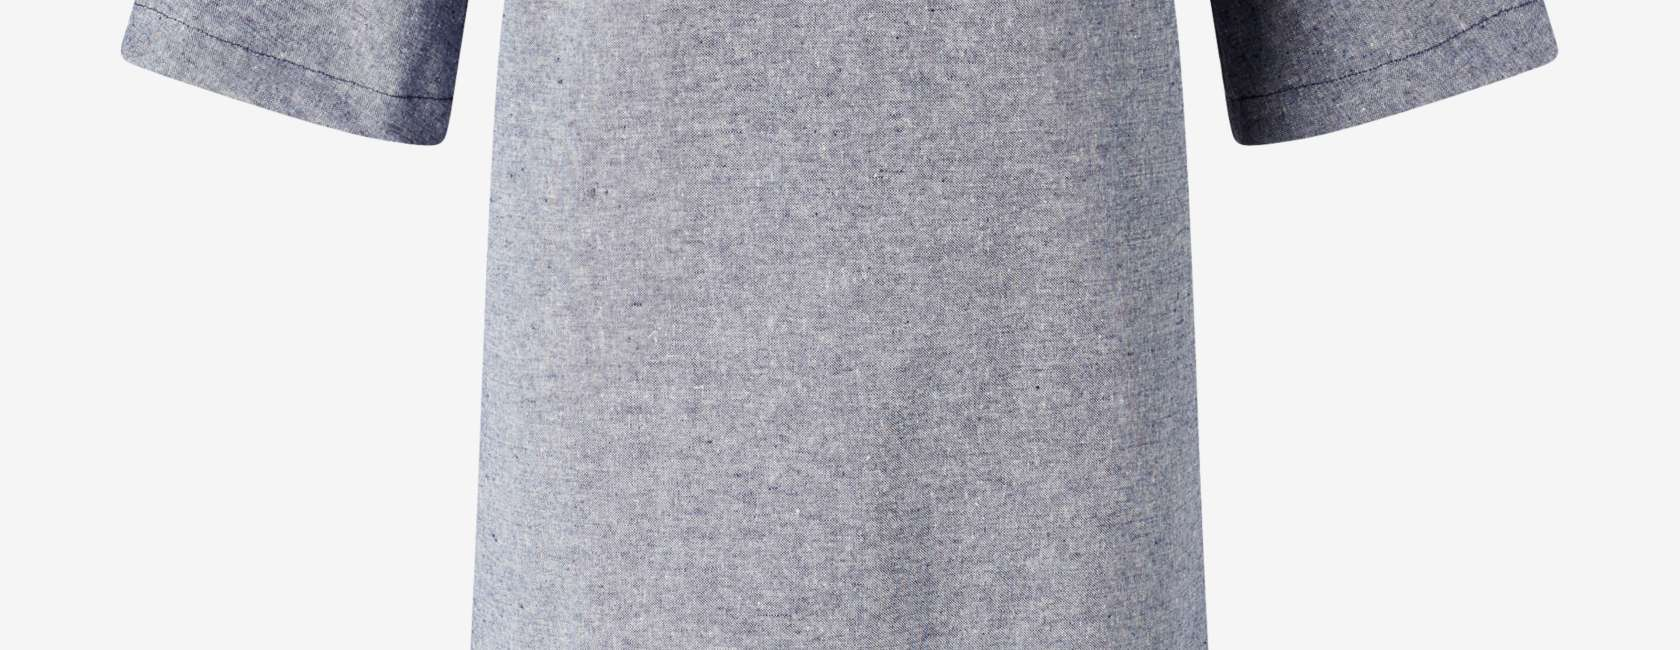 Vogue Women's Grey Dress Project, 8805 At John Lewis